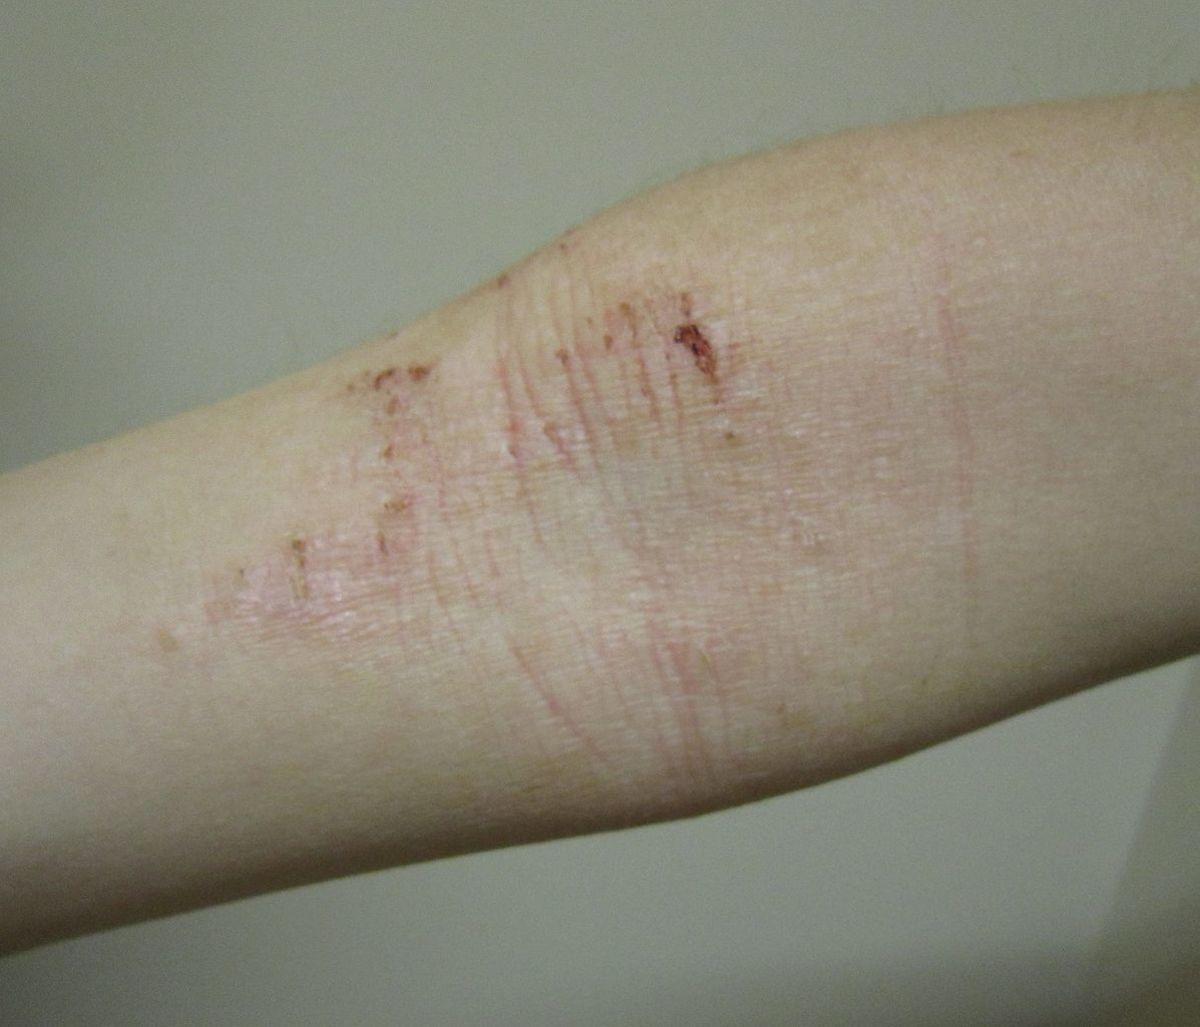 eczema symptoms and cure